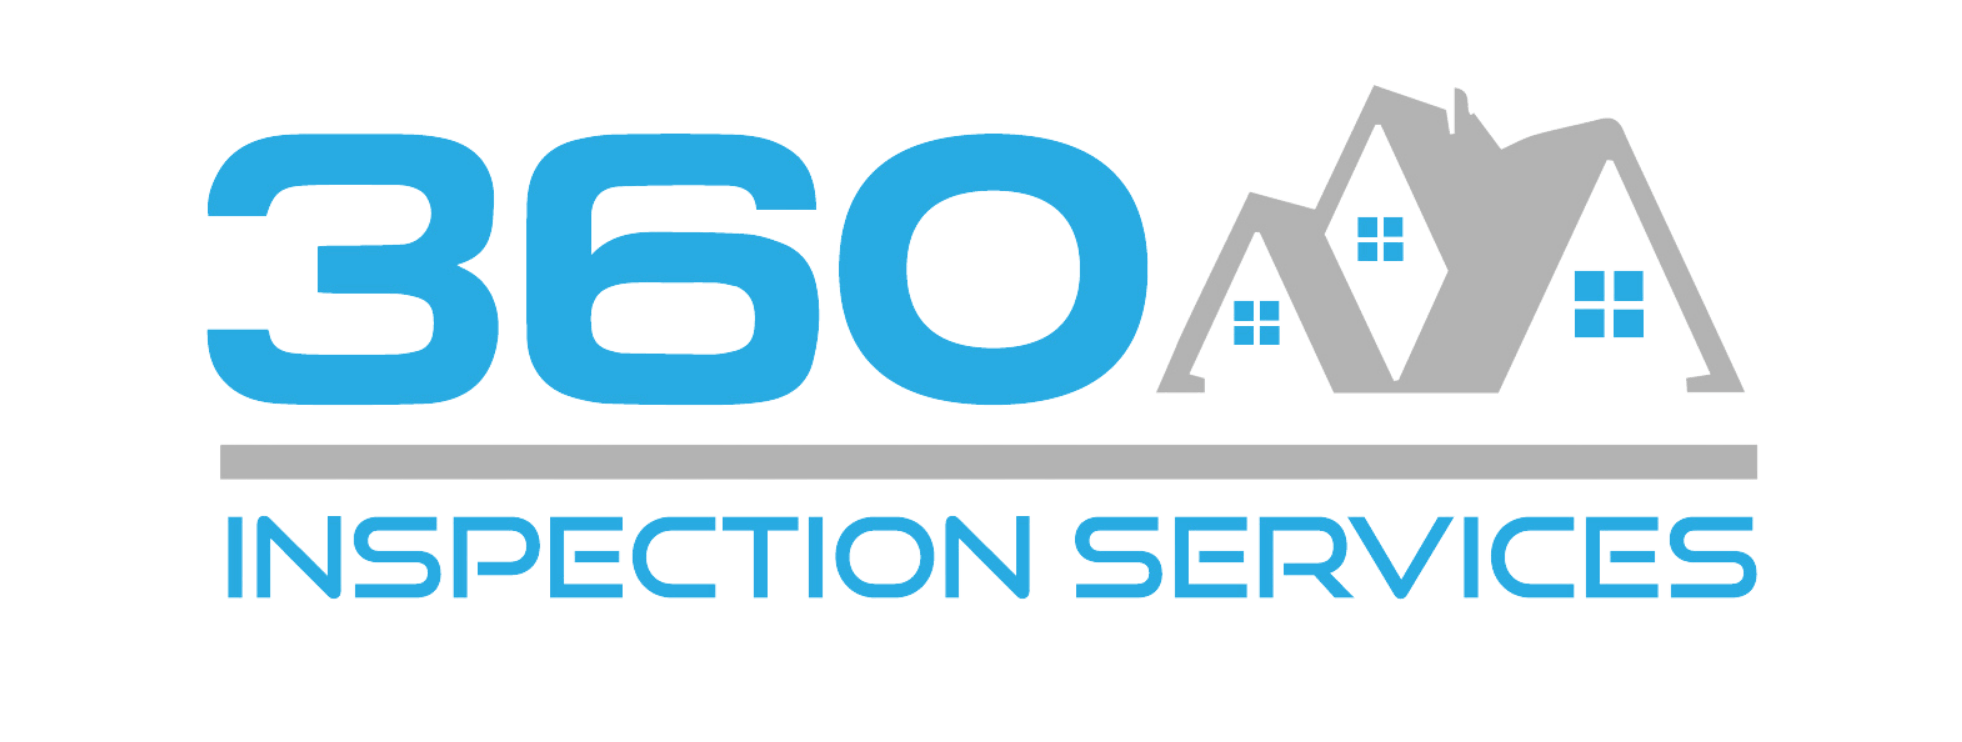 360 inspections logo